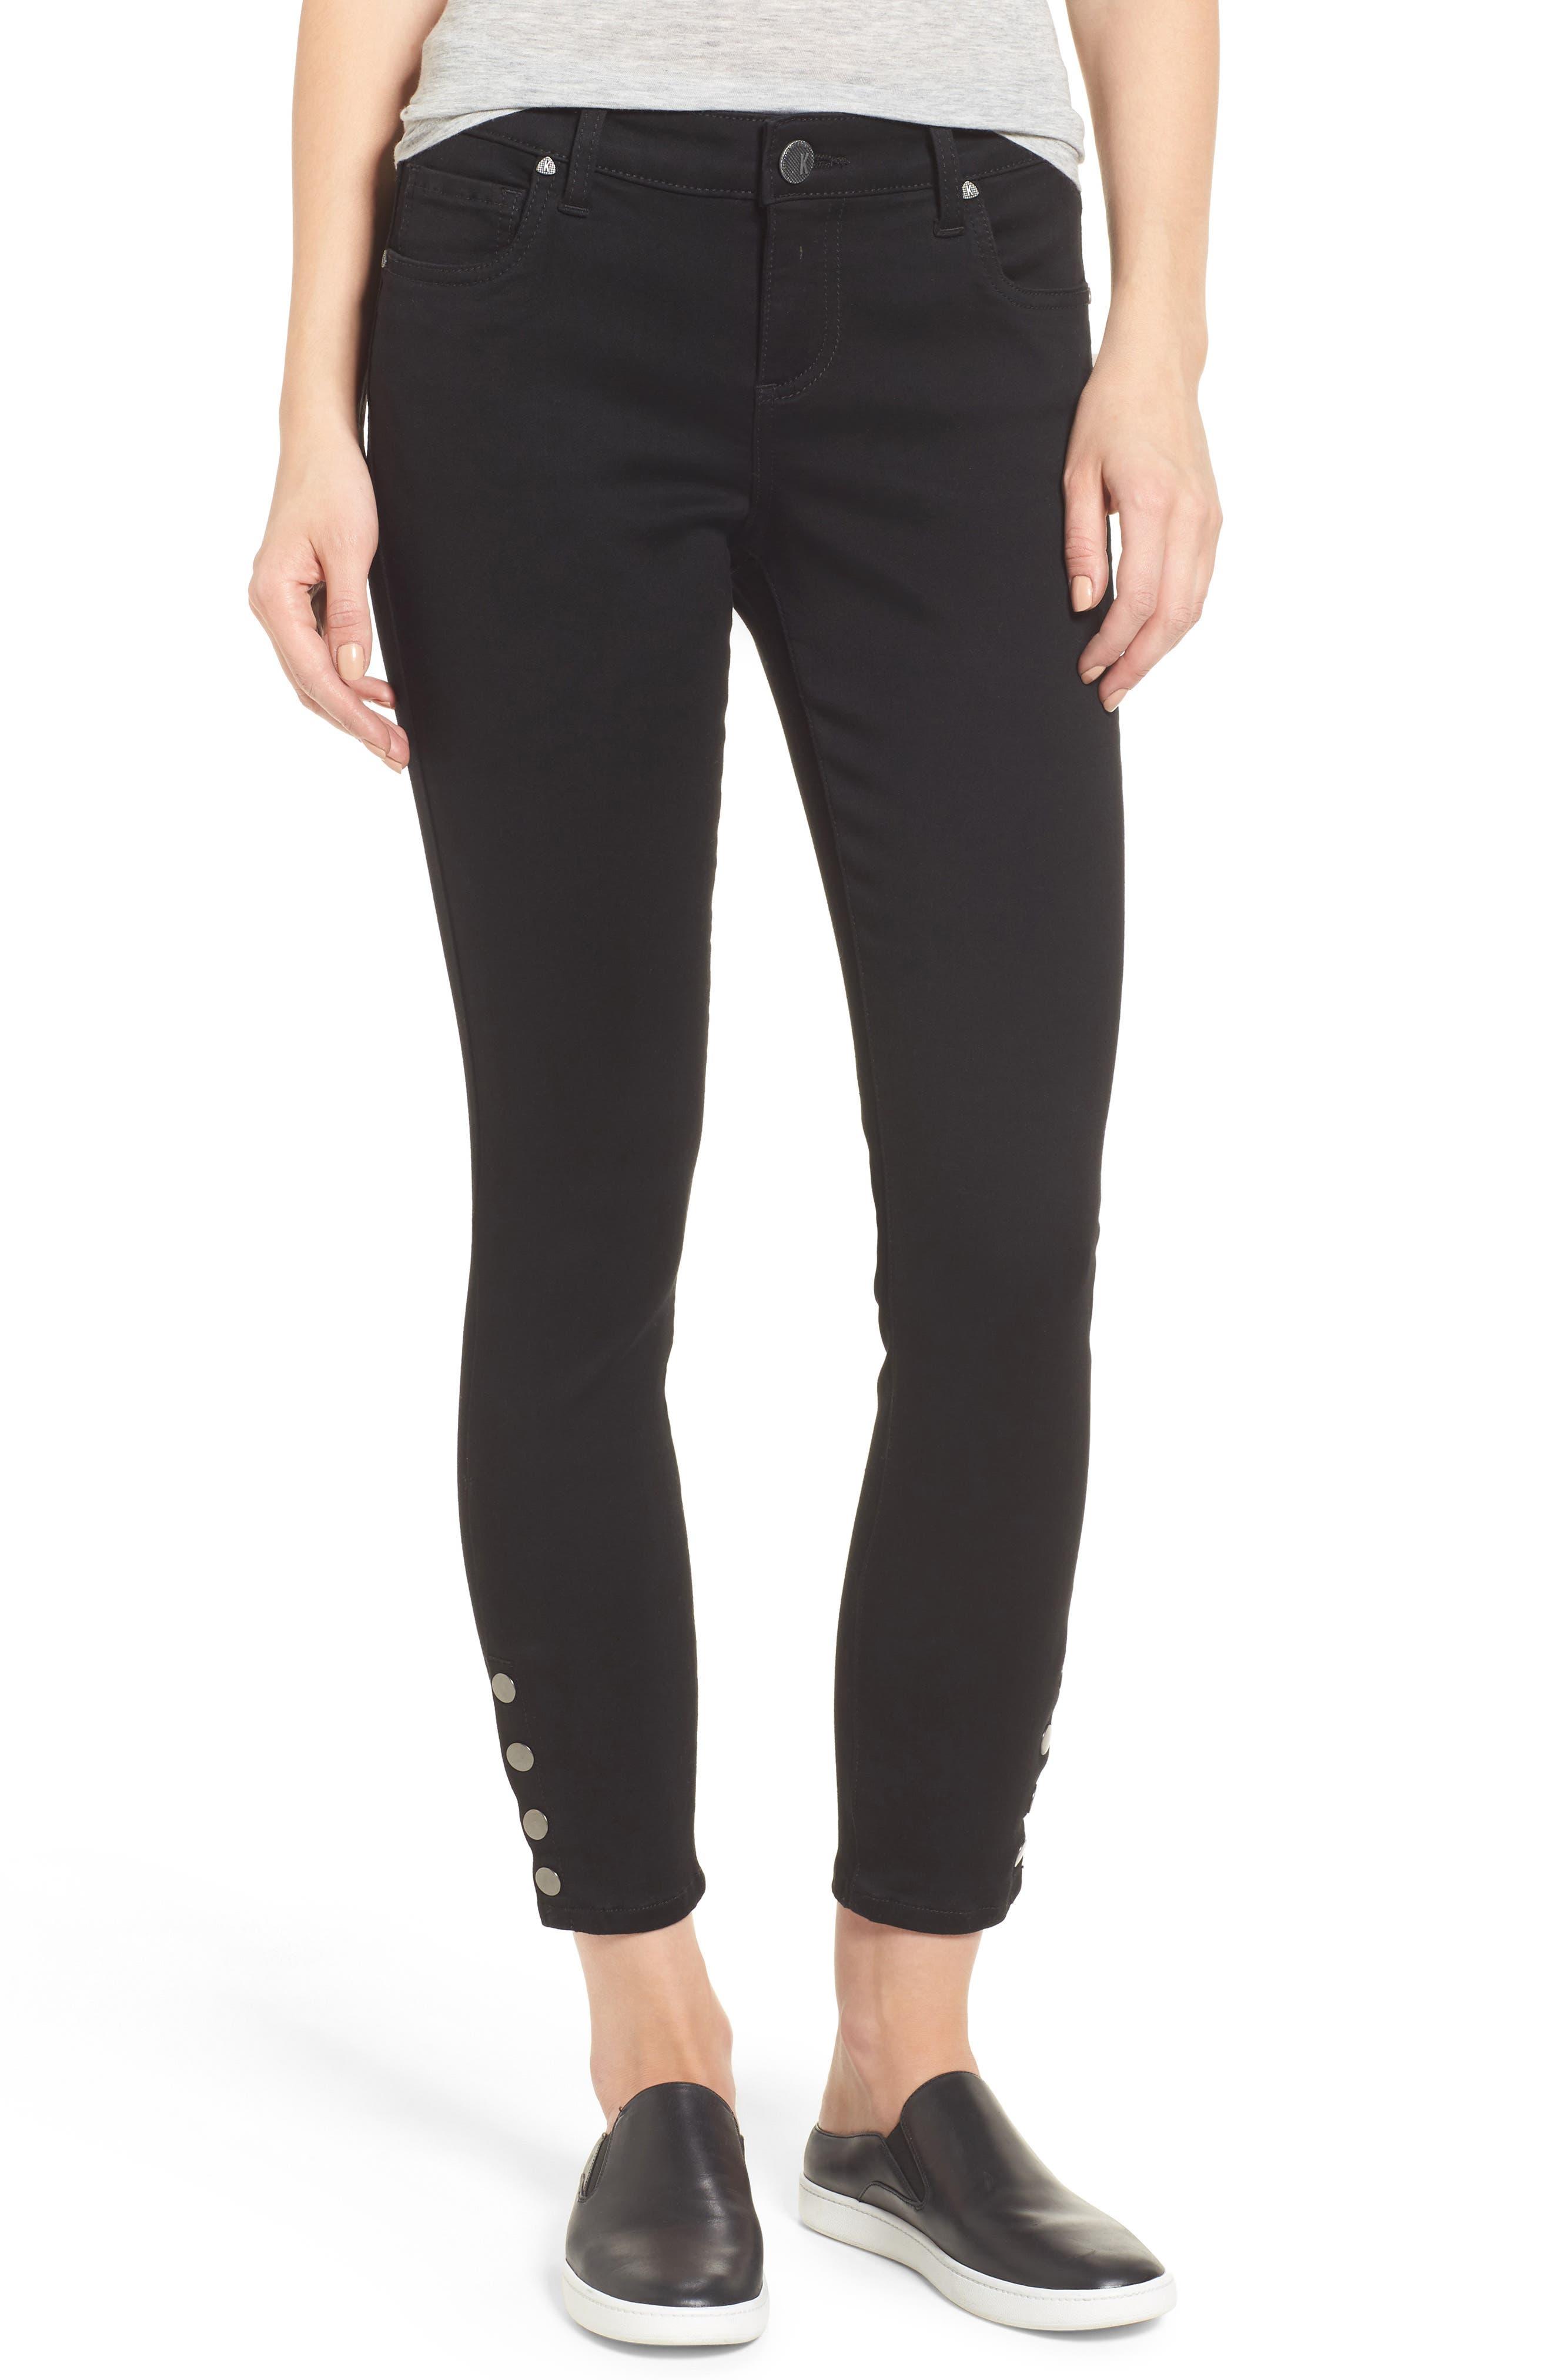 Snap Ankle Jeans,                         Main,                         color, Black